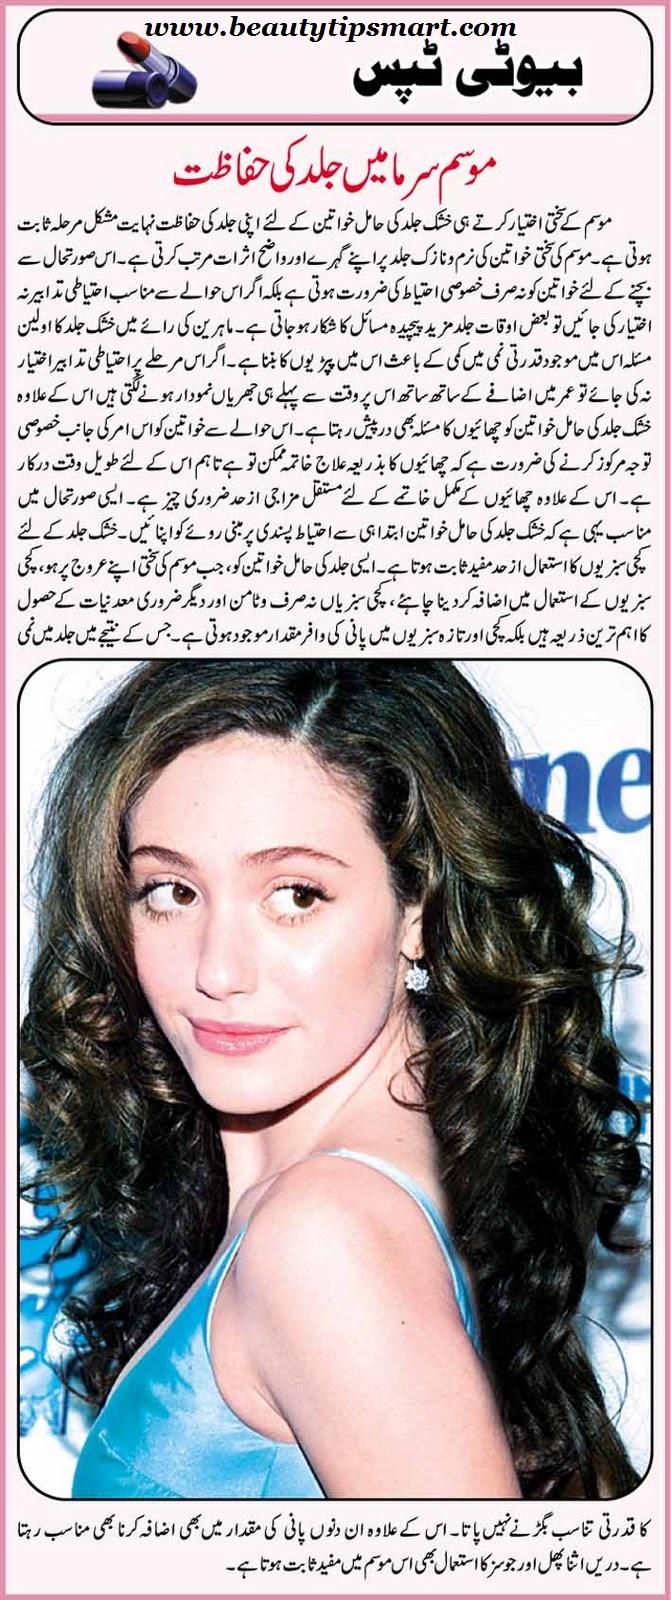 Winter Skin Care Homemade Tips in Urdu